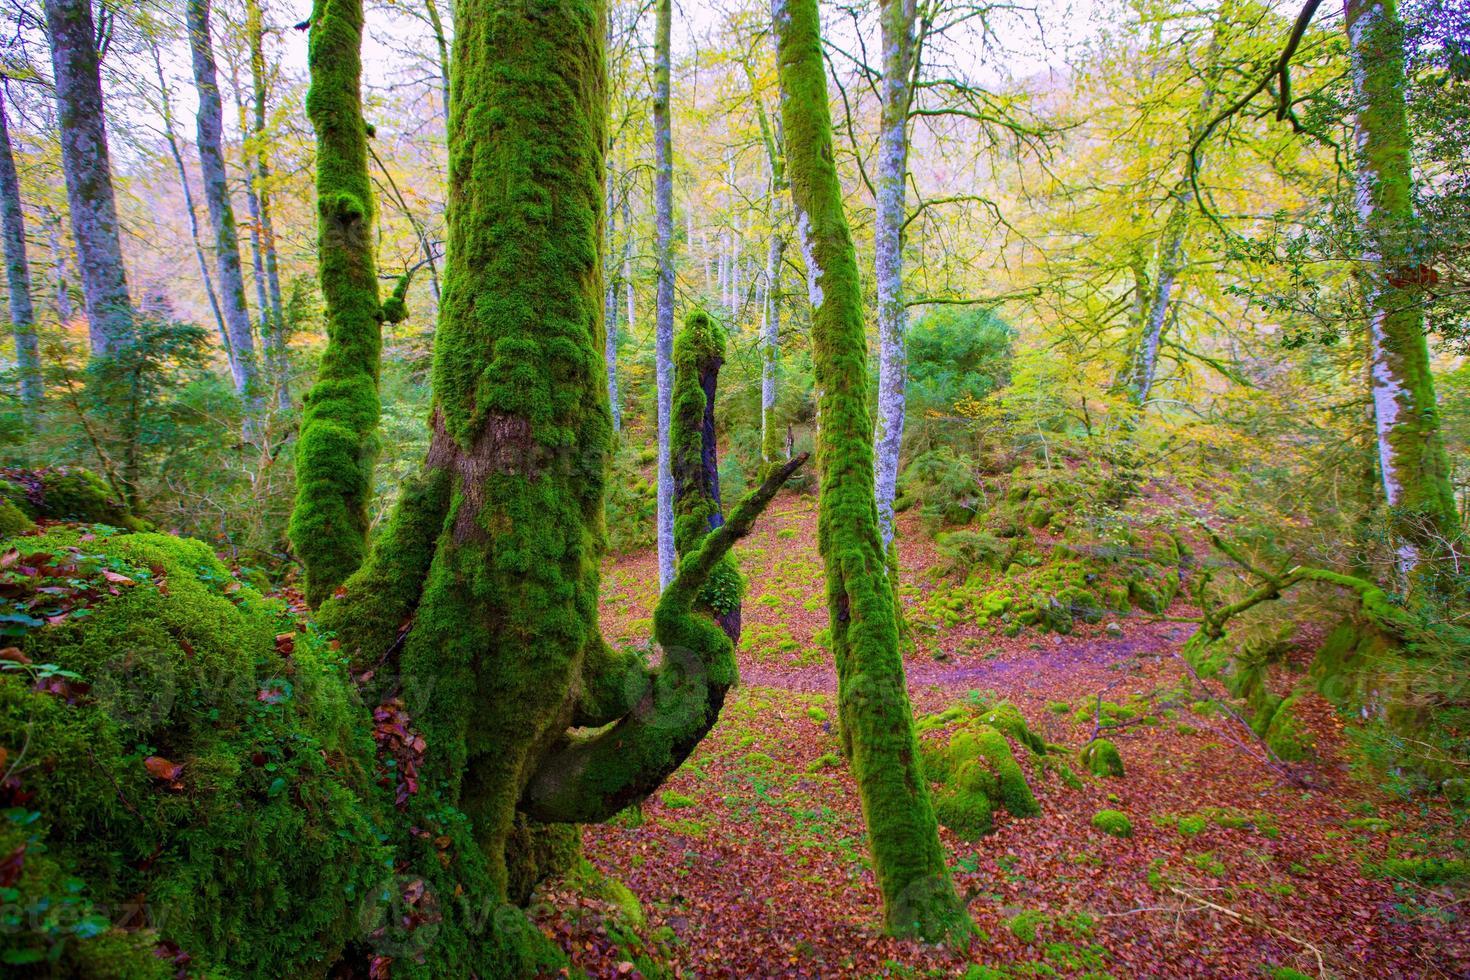 Autumn Selva de Irati beech jungle in Navarra Pyrenees Spain photo